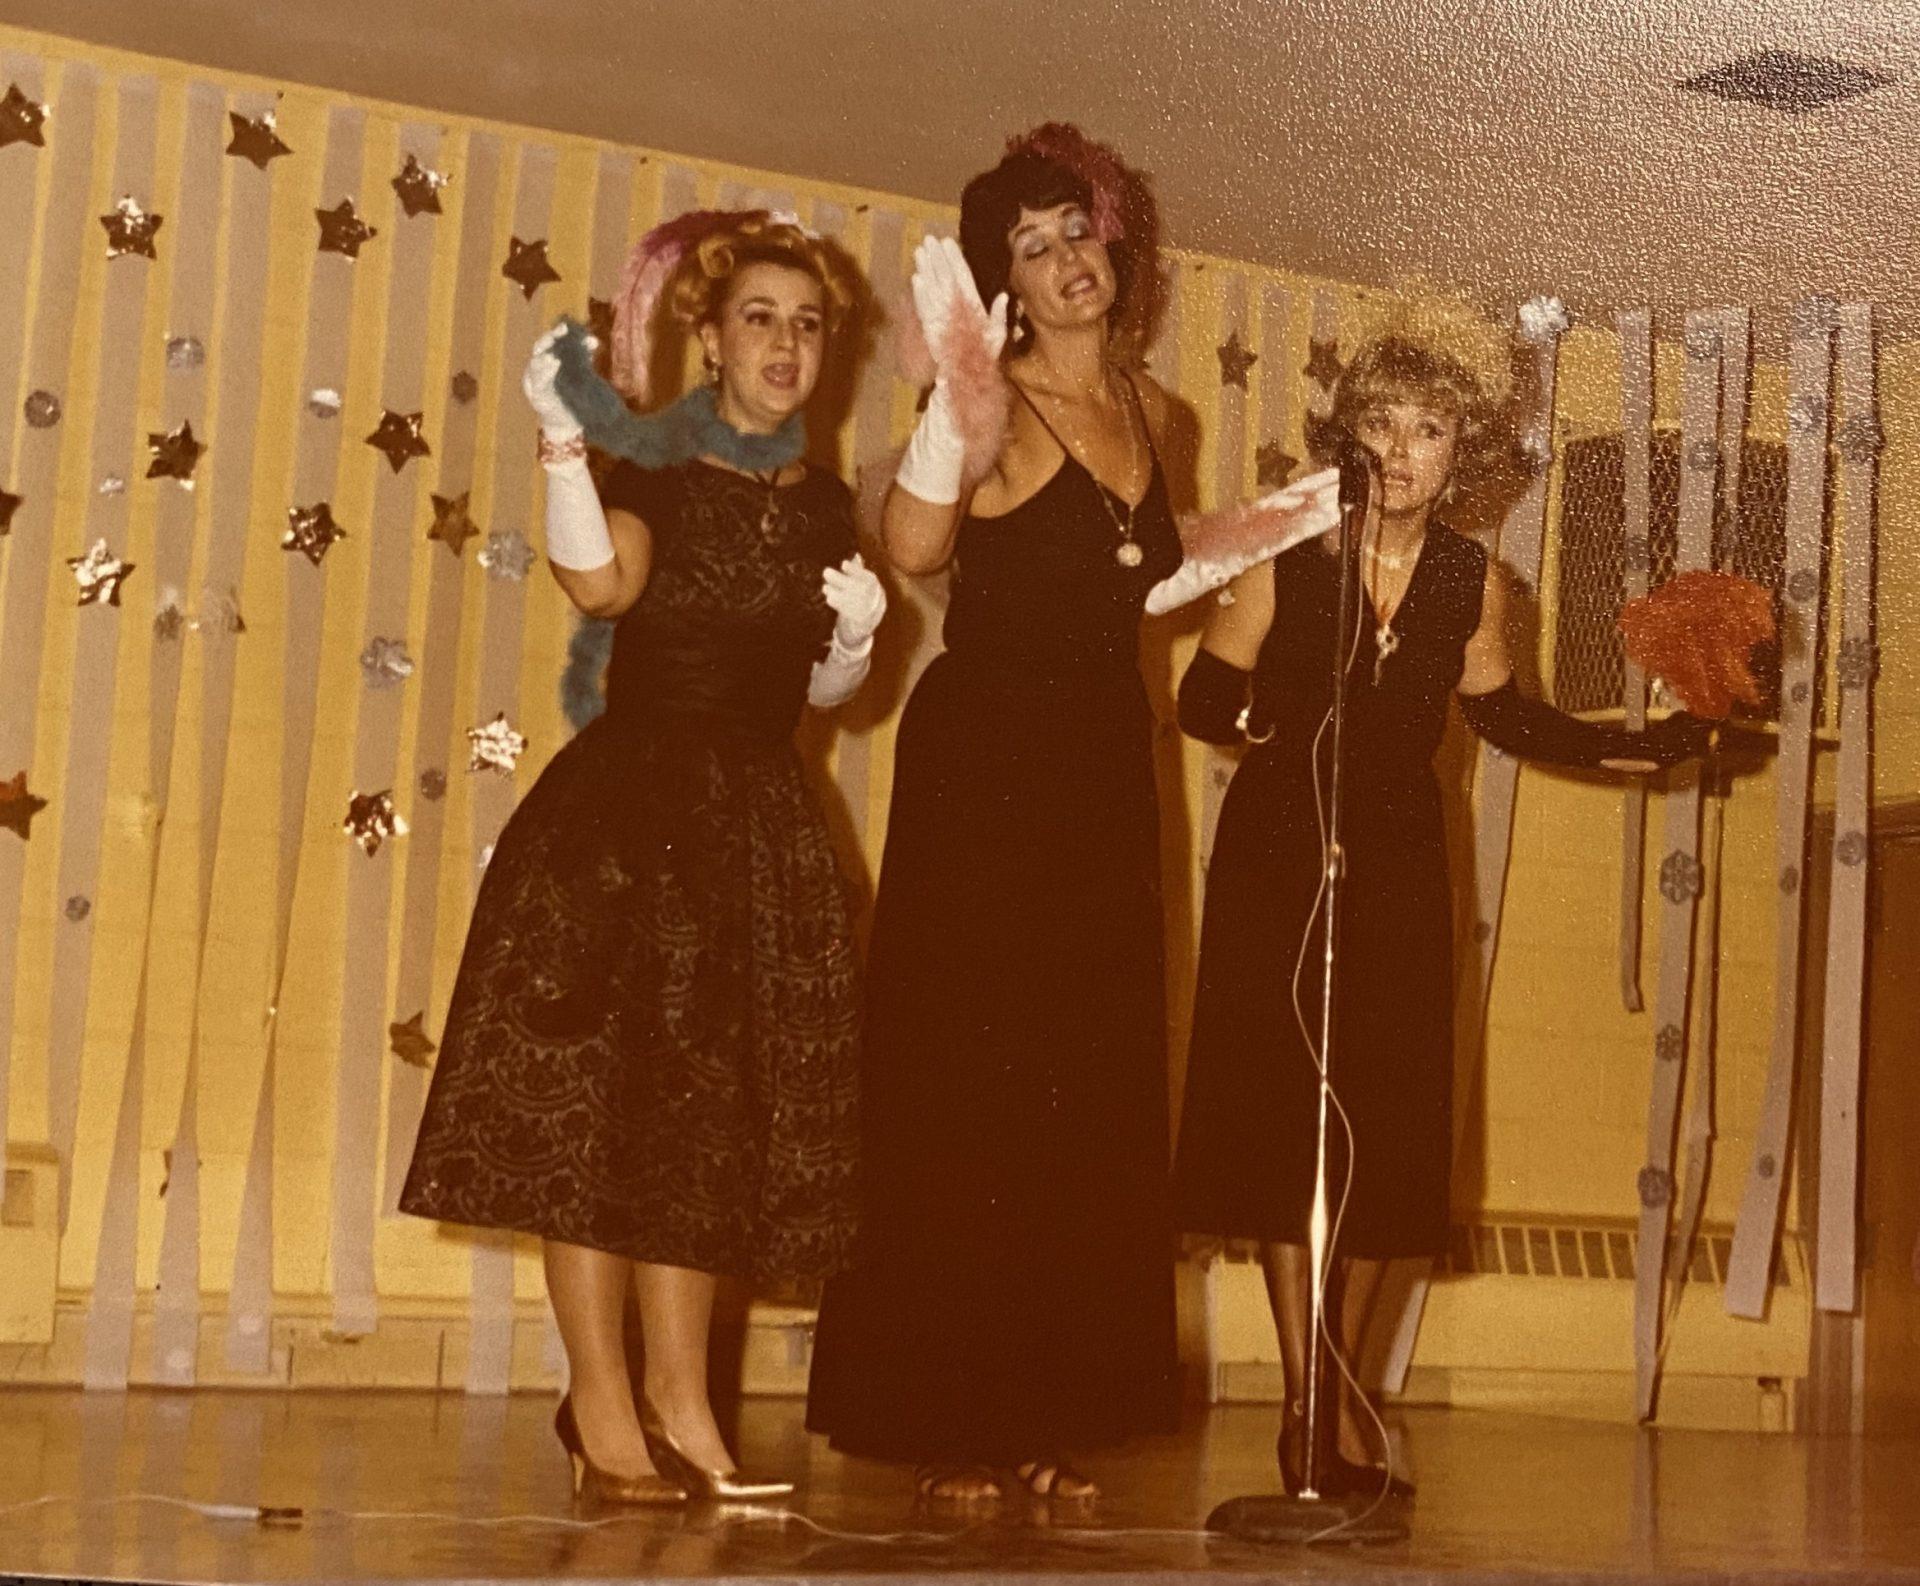 The Lemon Sisters!